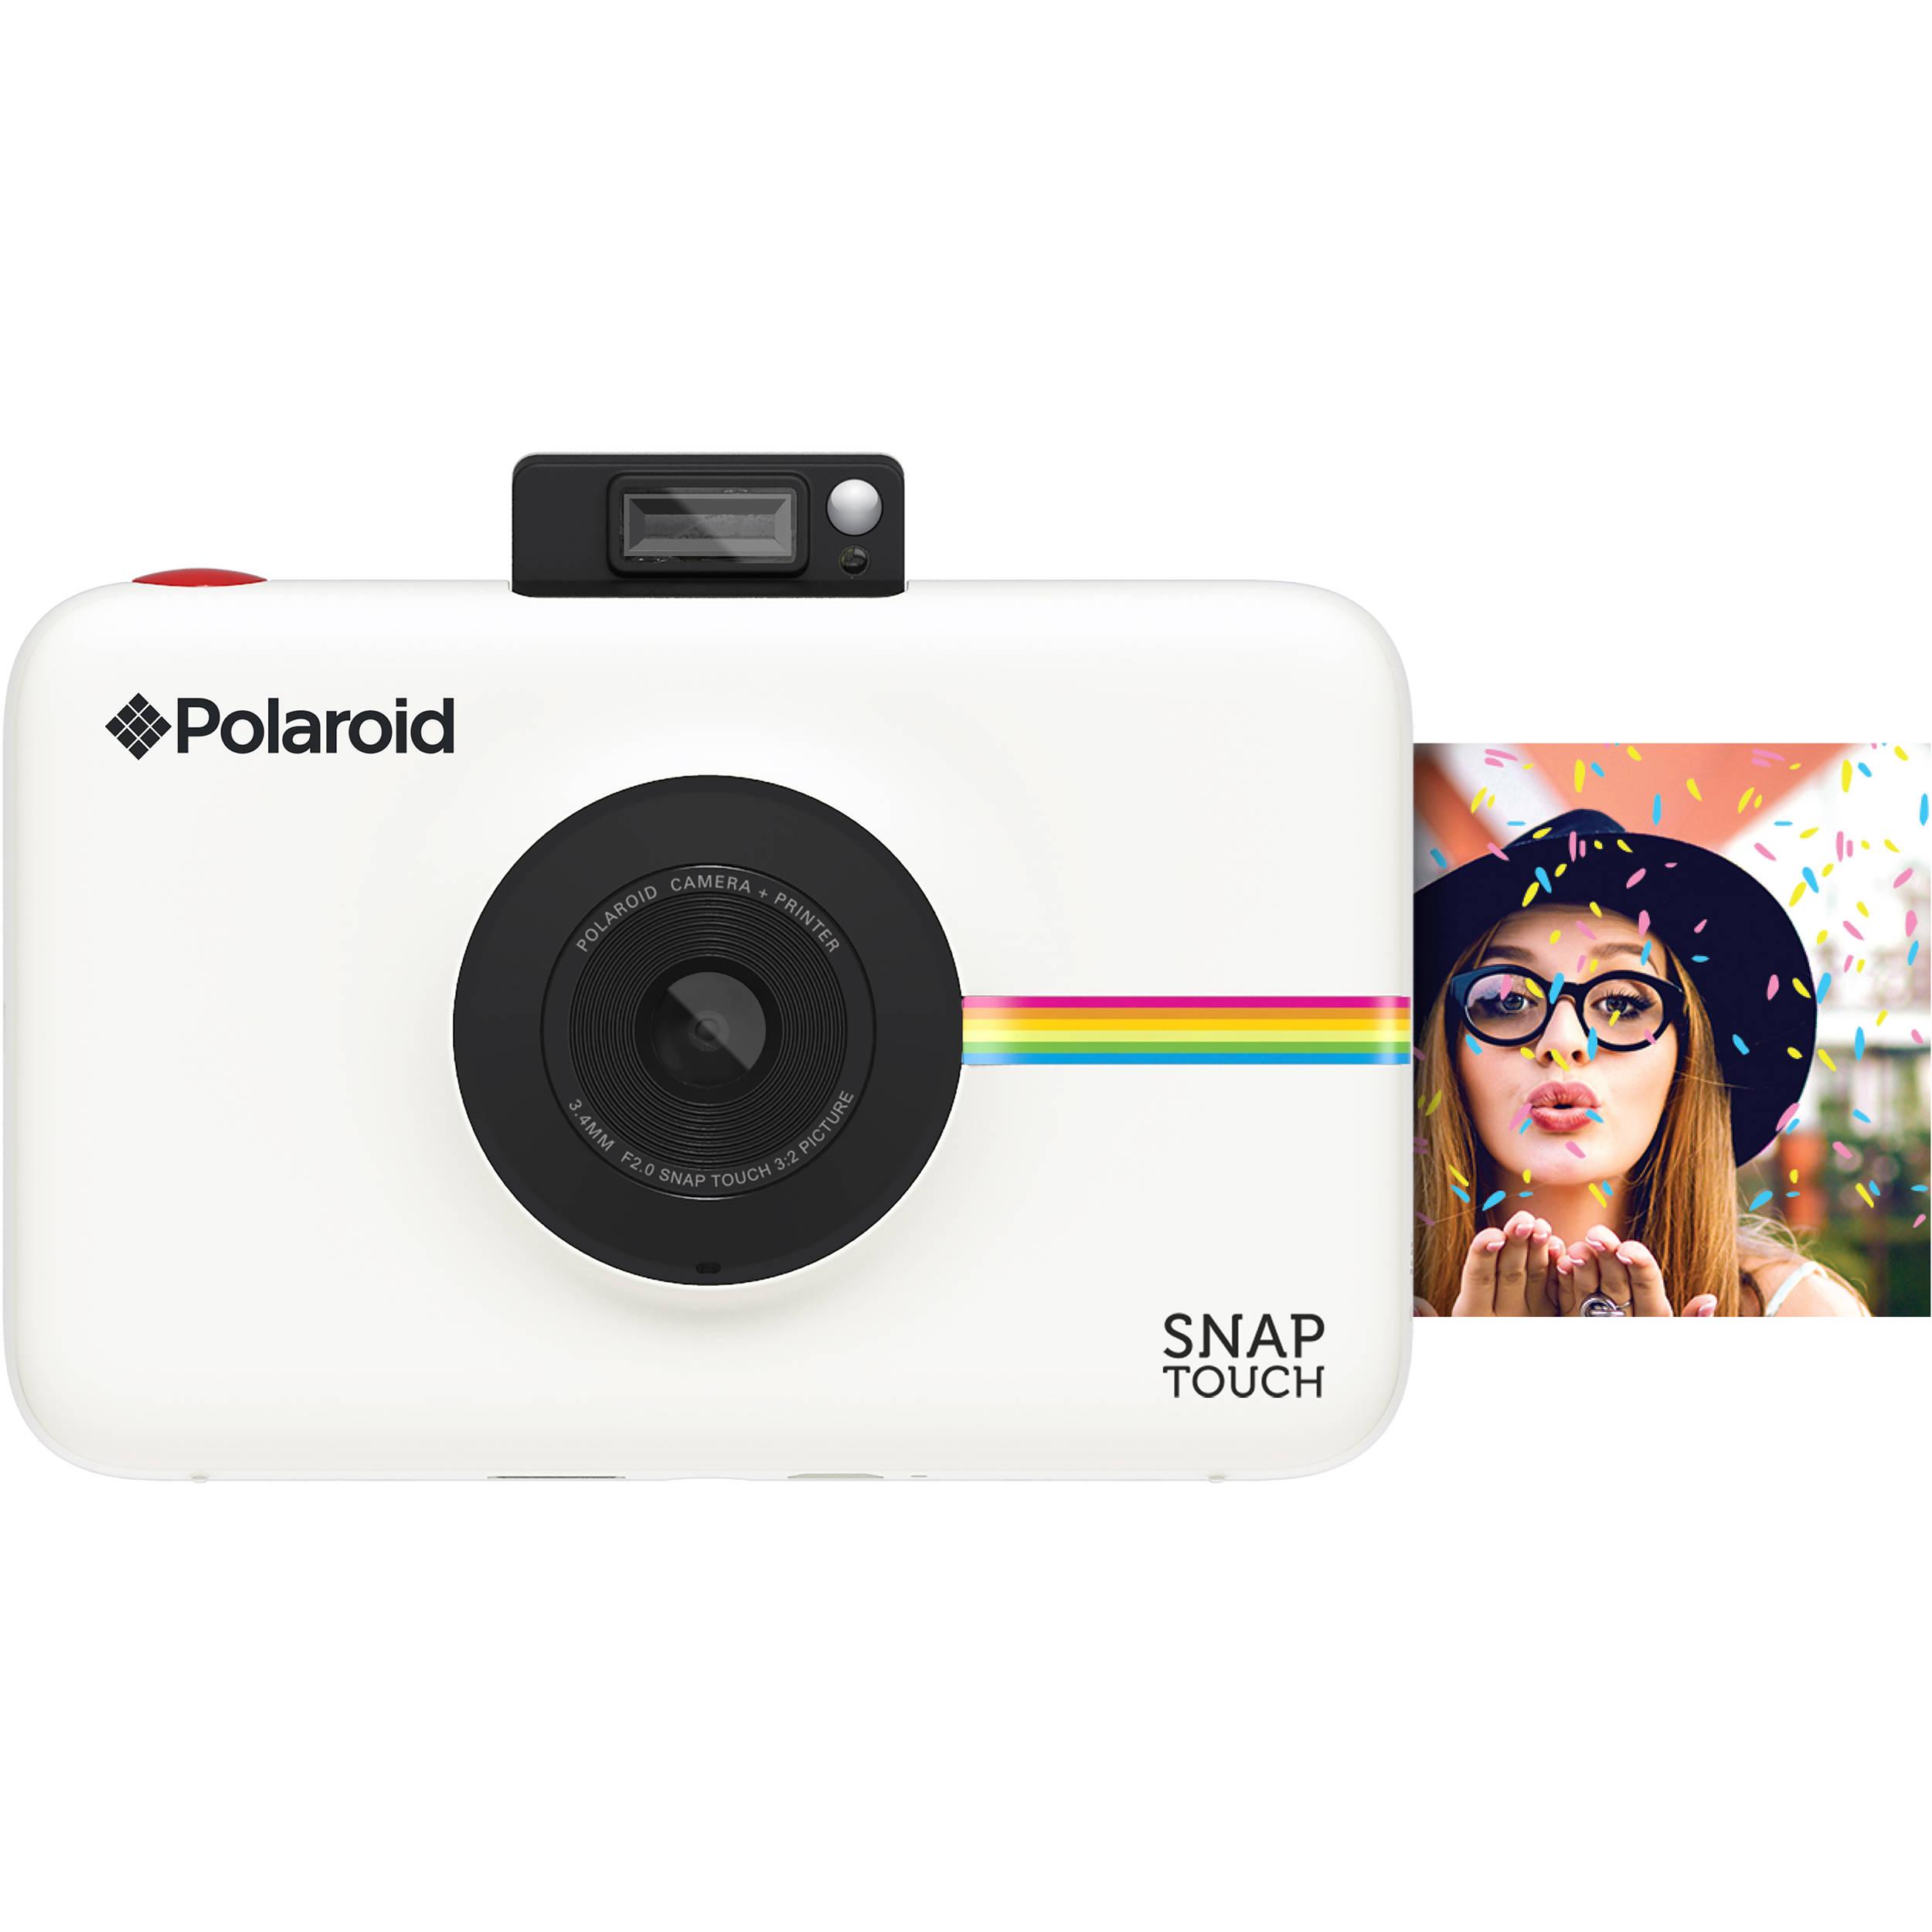 f61e3722aee67 Polaroid Snap Touch Instant Digital Camera (White) POLSTW B H